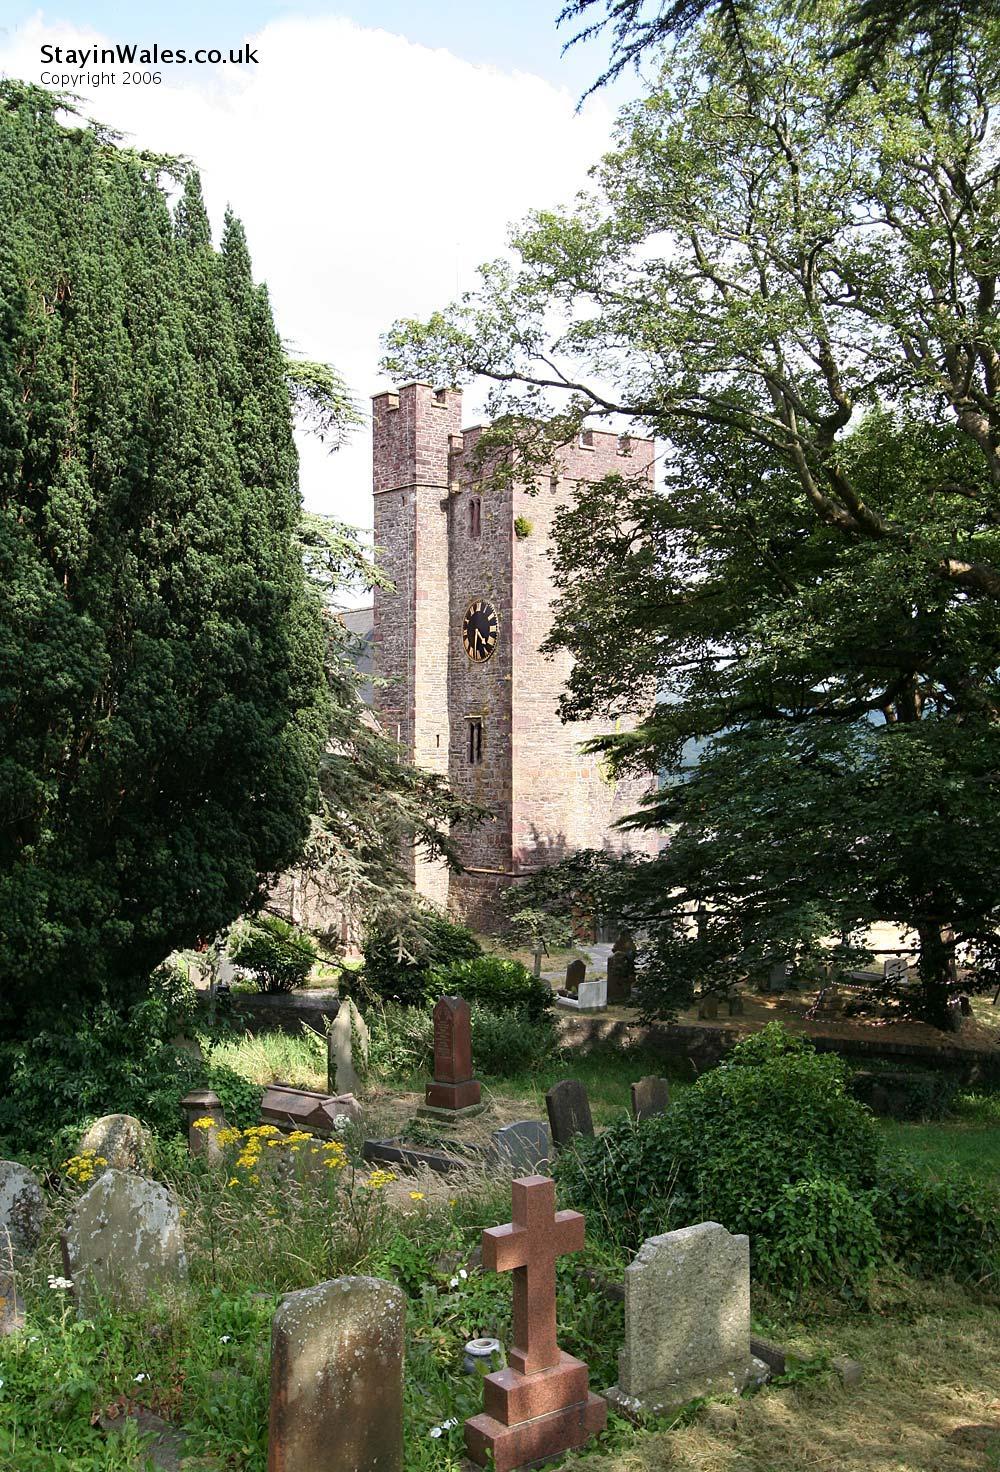 St Teilo's Church, Llandeilo